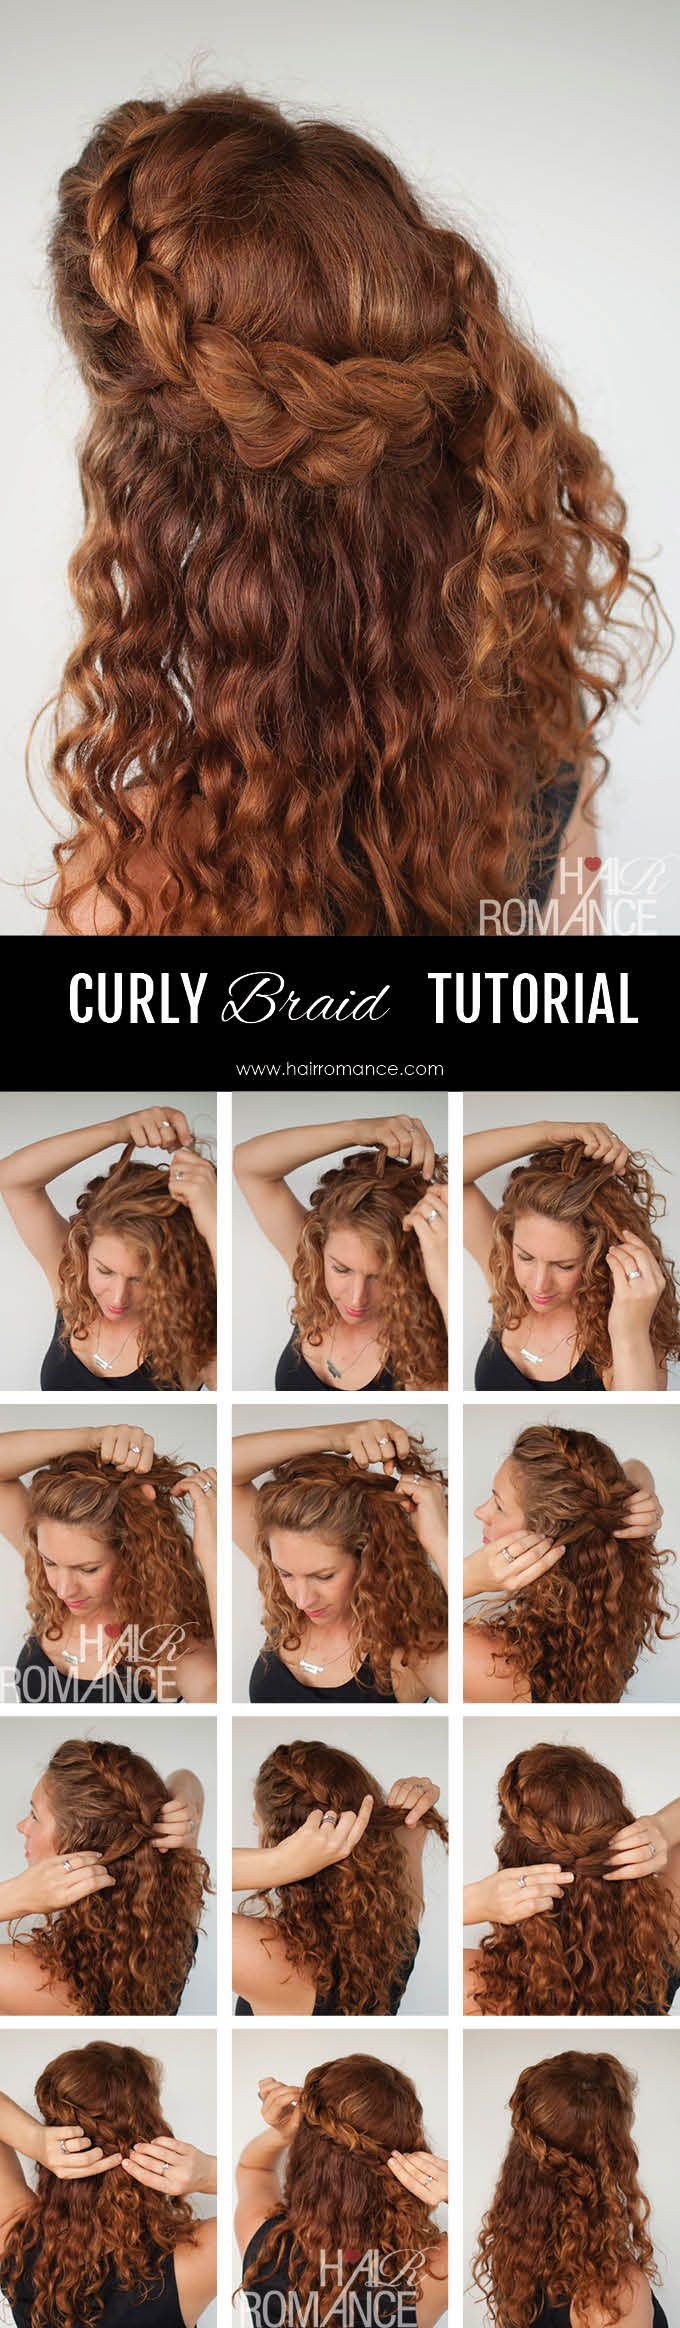 Curly hair tutorial u the halfup braid hairstyle cute hairstyles